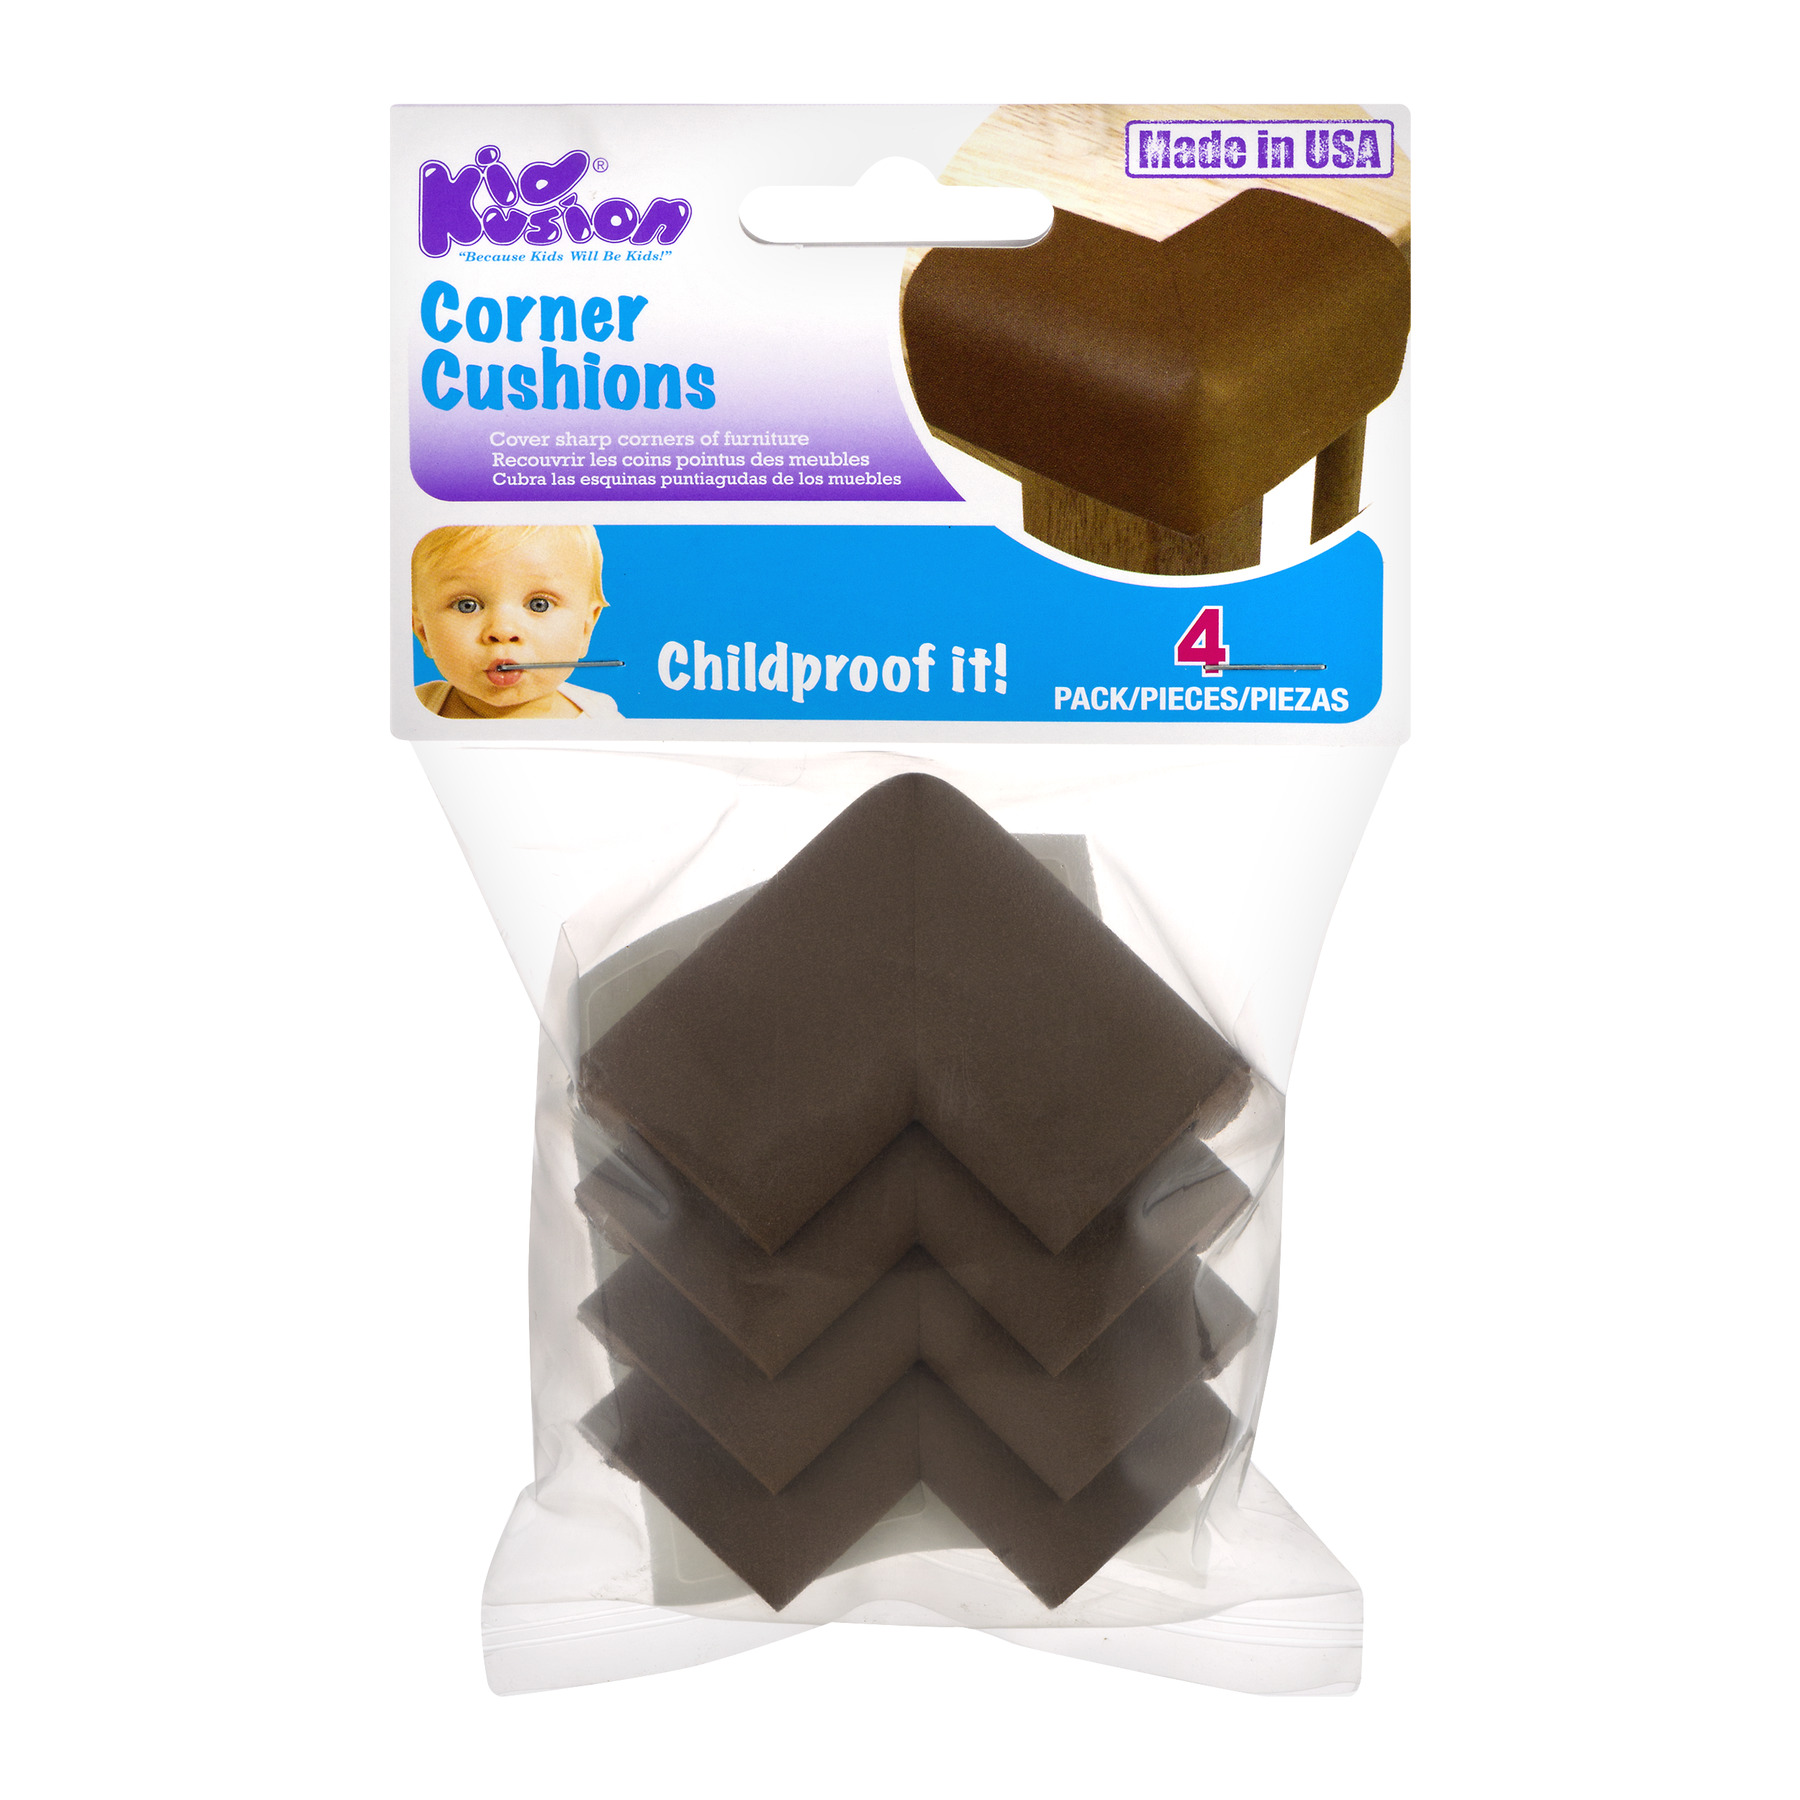 KidKusion Corner Cushions, 1.0 CT